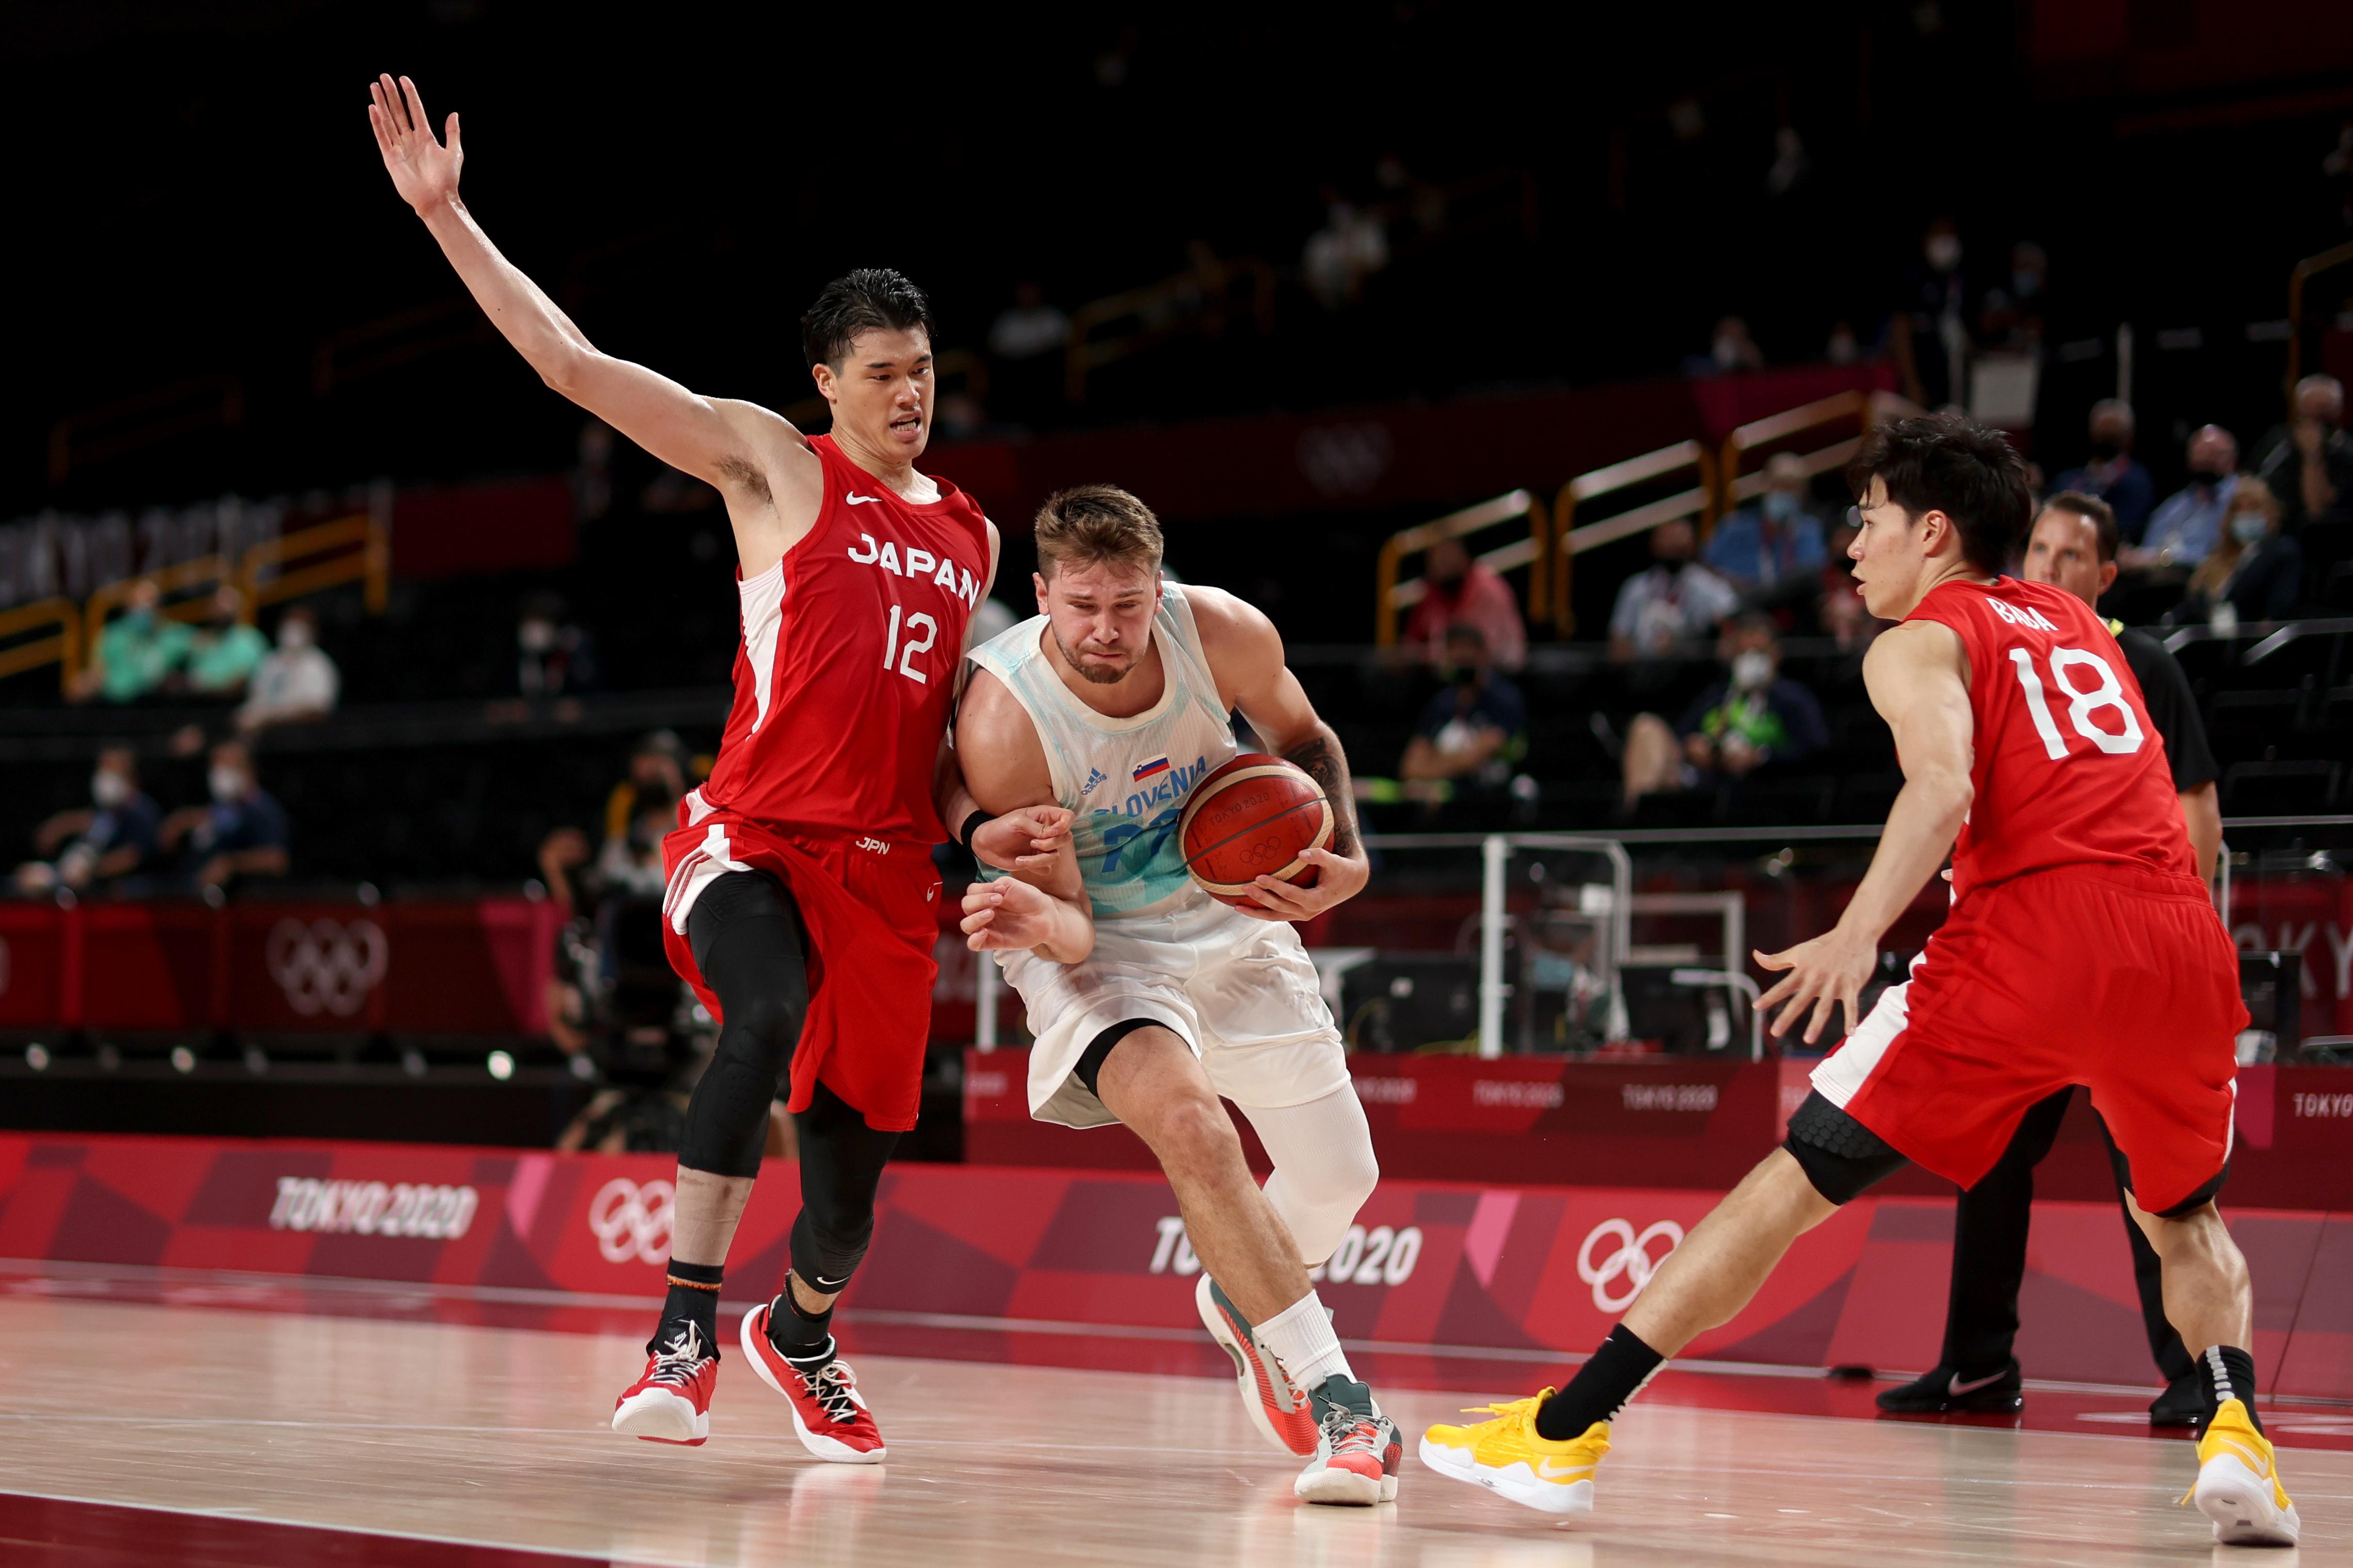 Tokyo 2020 Olympics - Basketball - Men - Group C - Slovenia v Japan - Saitama Super Arena, Saitama, Japan - July 29, 2021. Luka Doncic of Slovenia in action with Y. Watanabe of Japan REUTERS/Alkis Konstantinidis